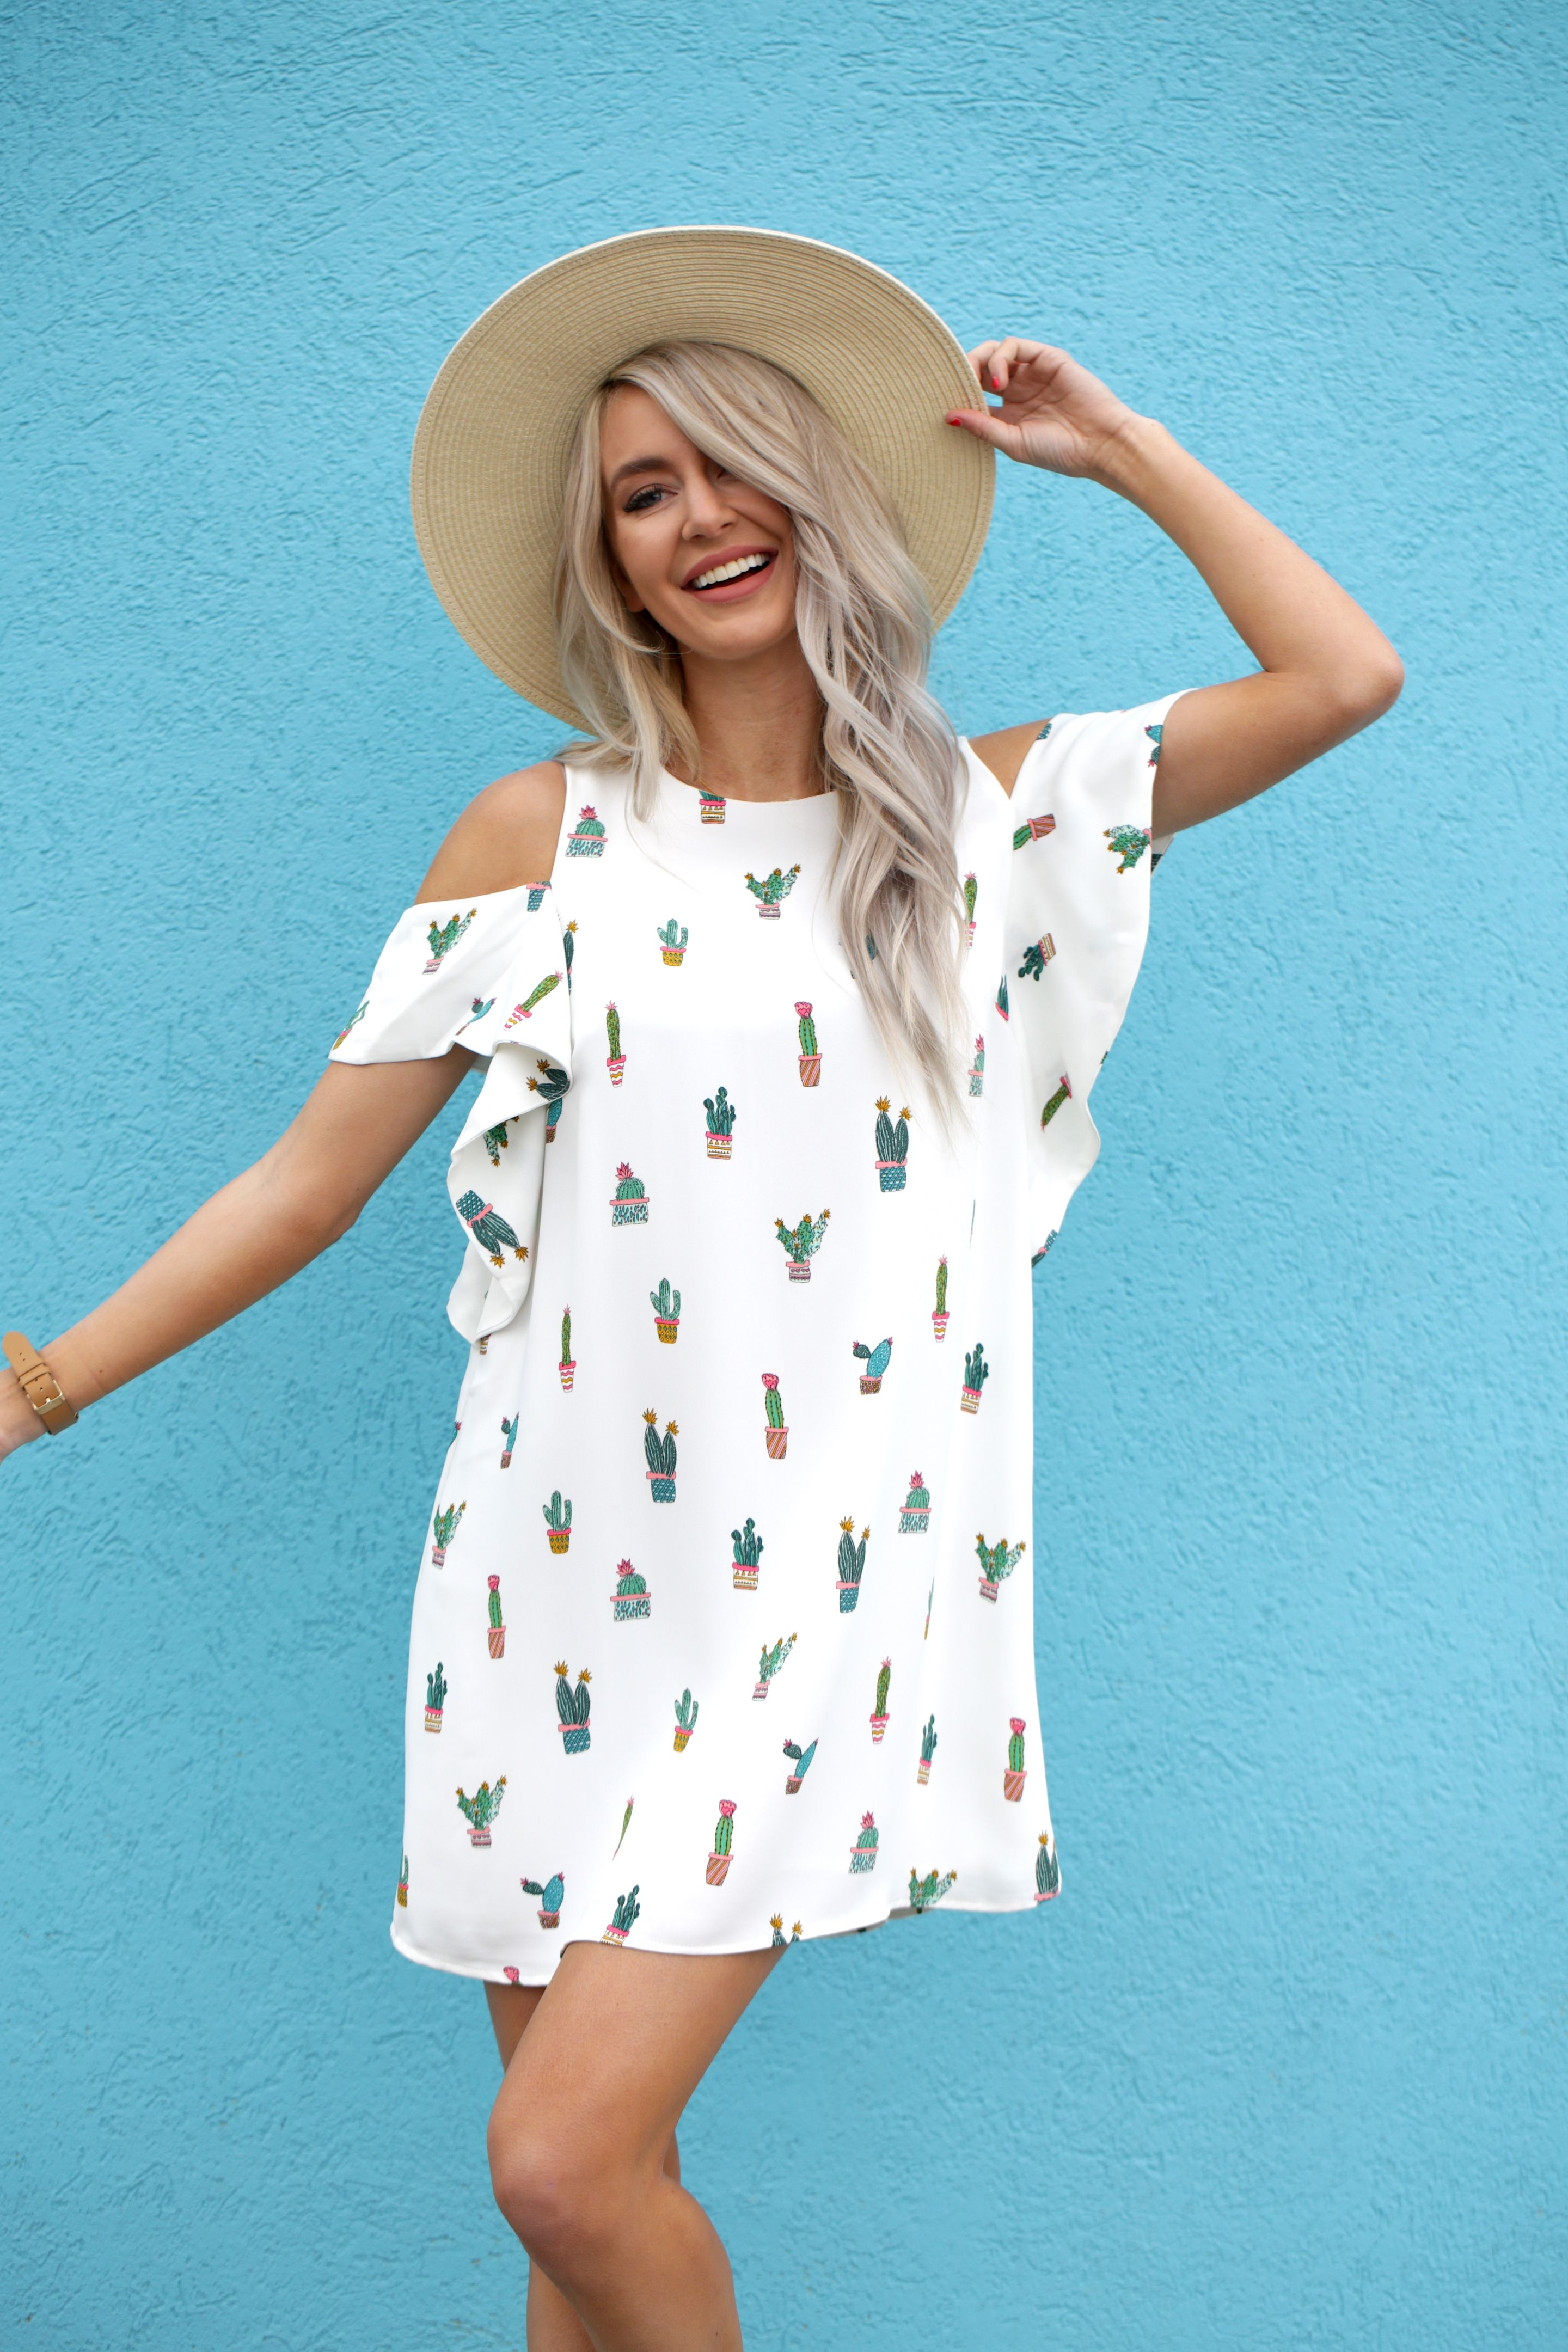 0bd4b539a727b Cold shoulder dress + cactus print   a dream come true! Catch this unique  flowy white cactus dress now!